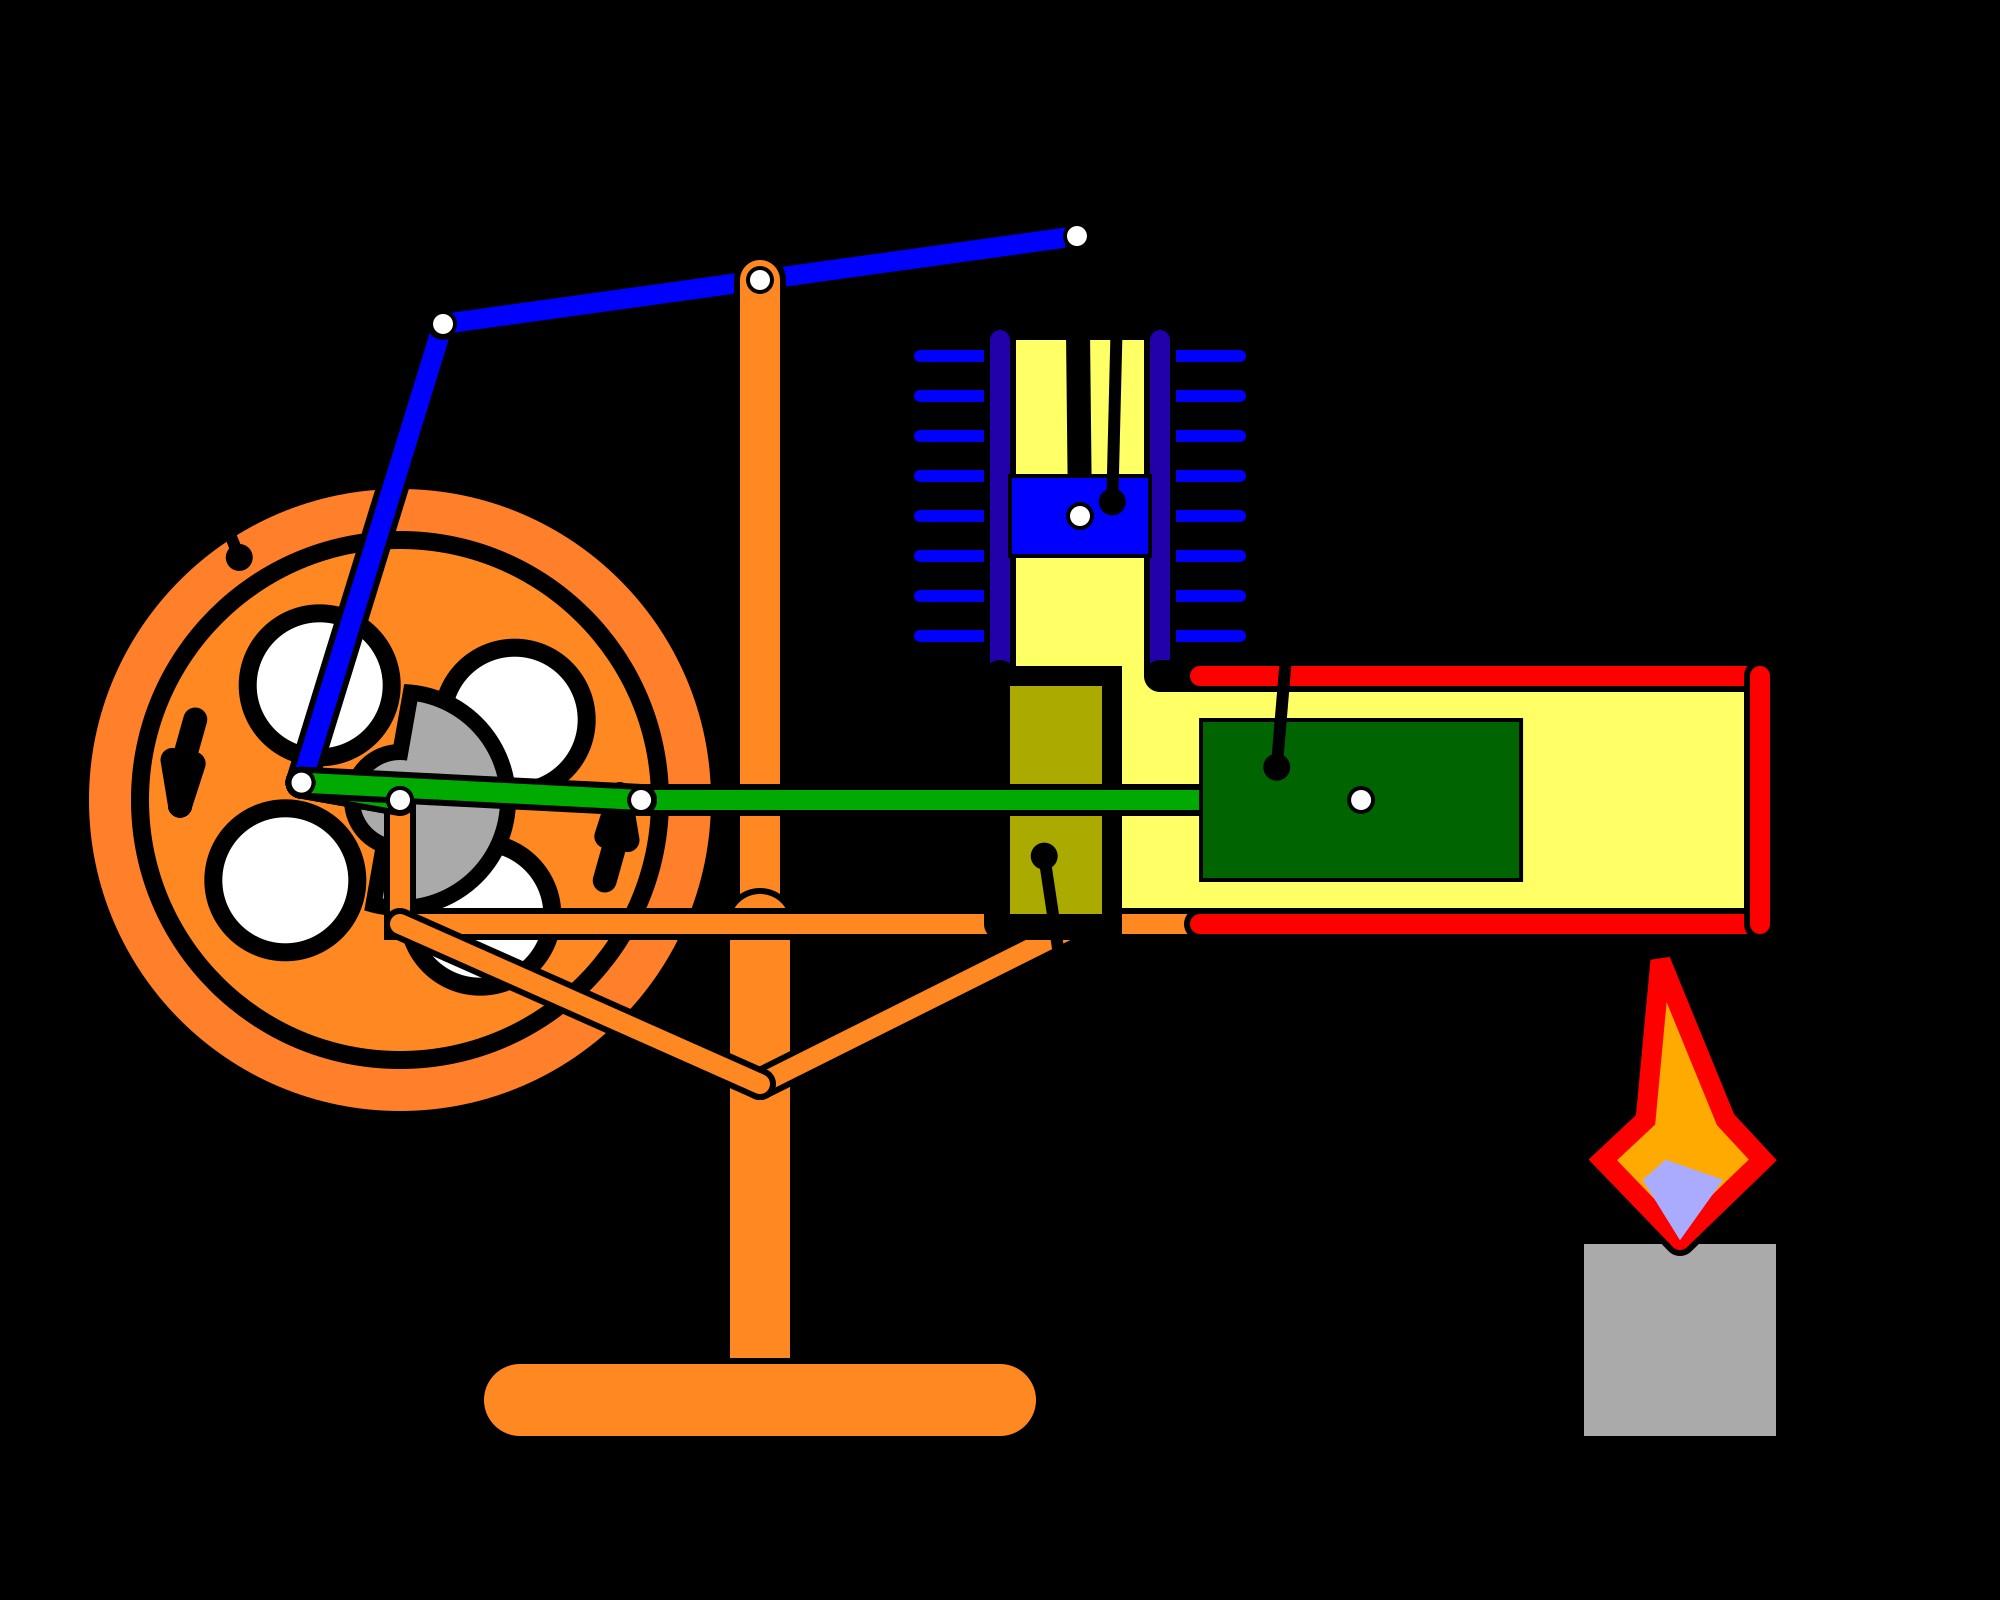 Stirling Engine Diagram Entropy Free Full Text  U2013 My Wiring